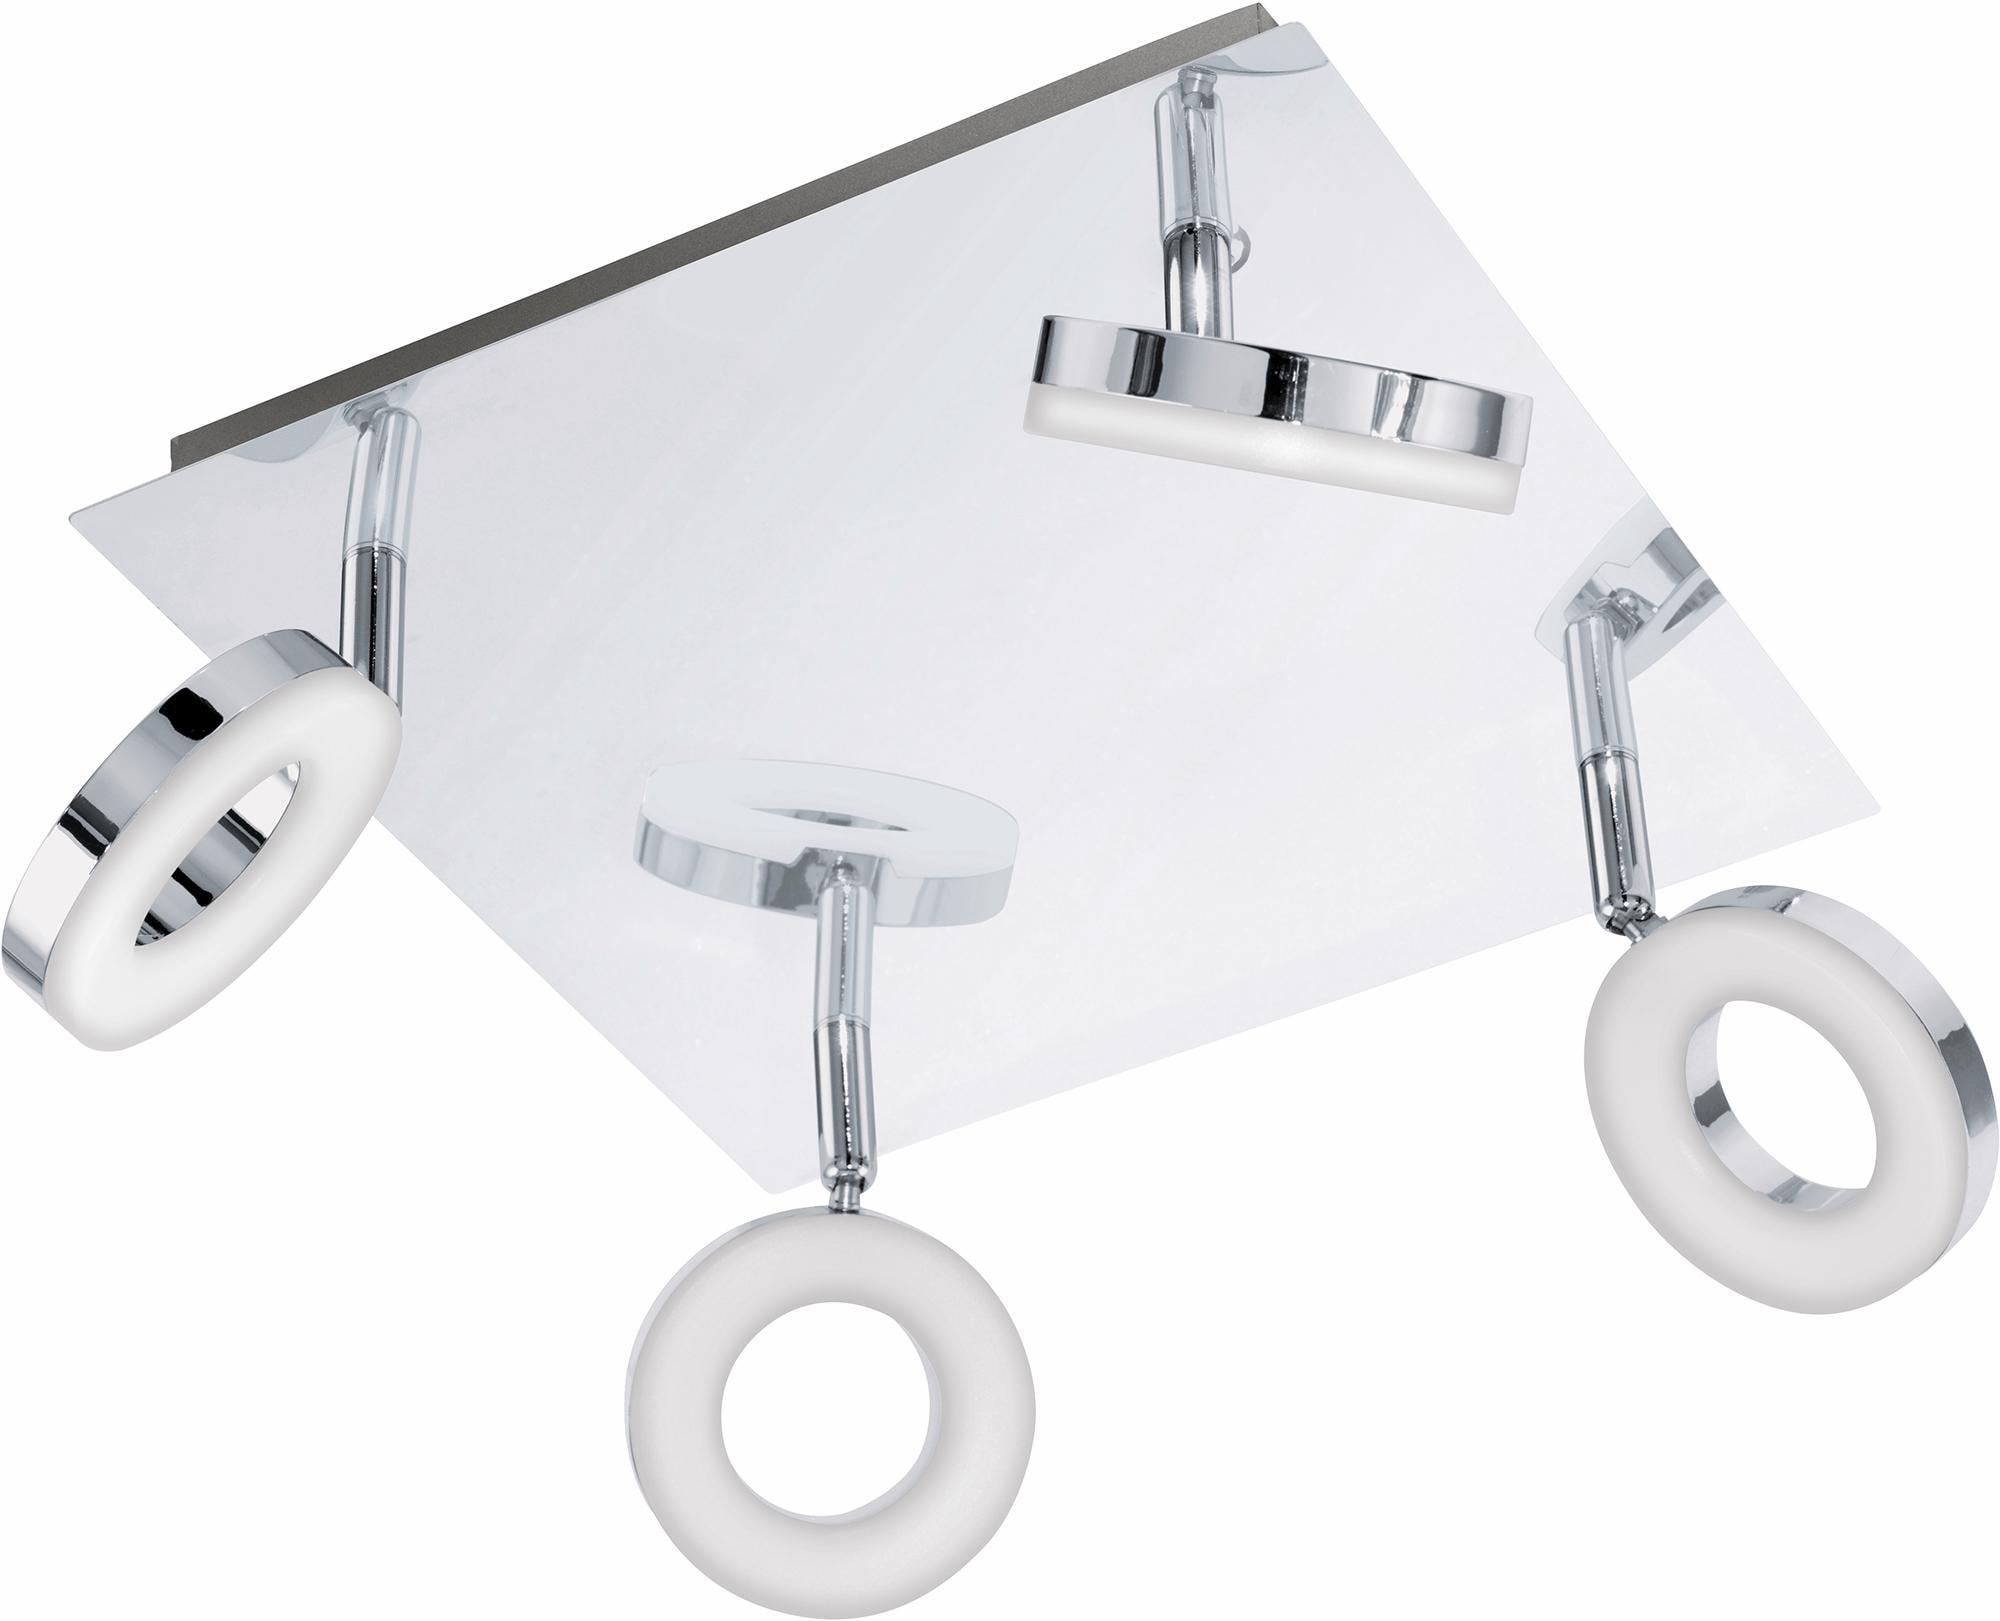 Eglo LED Deckenleuchte, Badleuchte, 4flg., 28x28 cm, »GONARO«